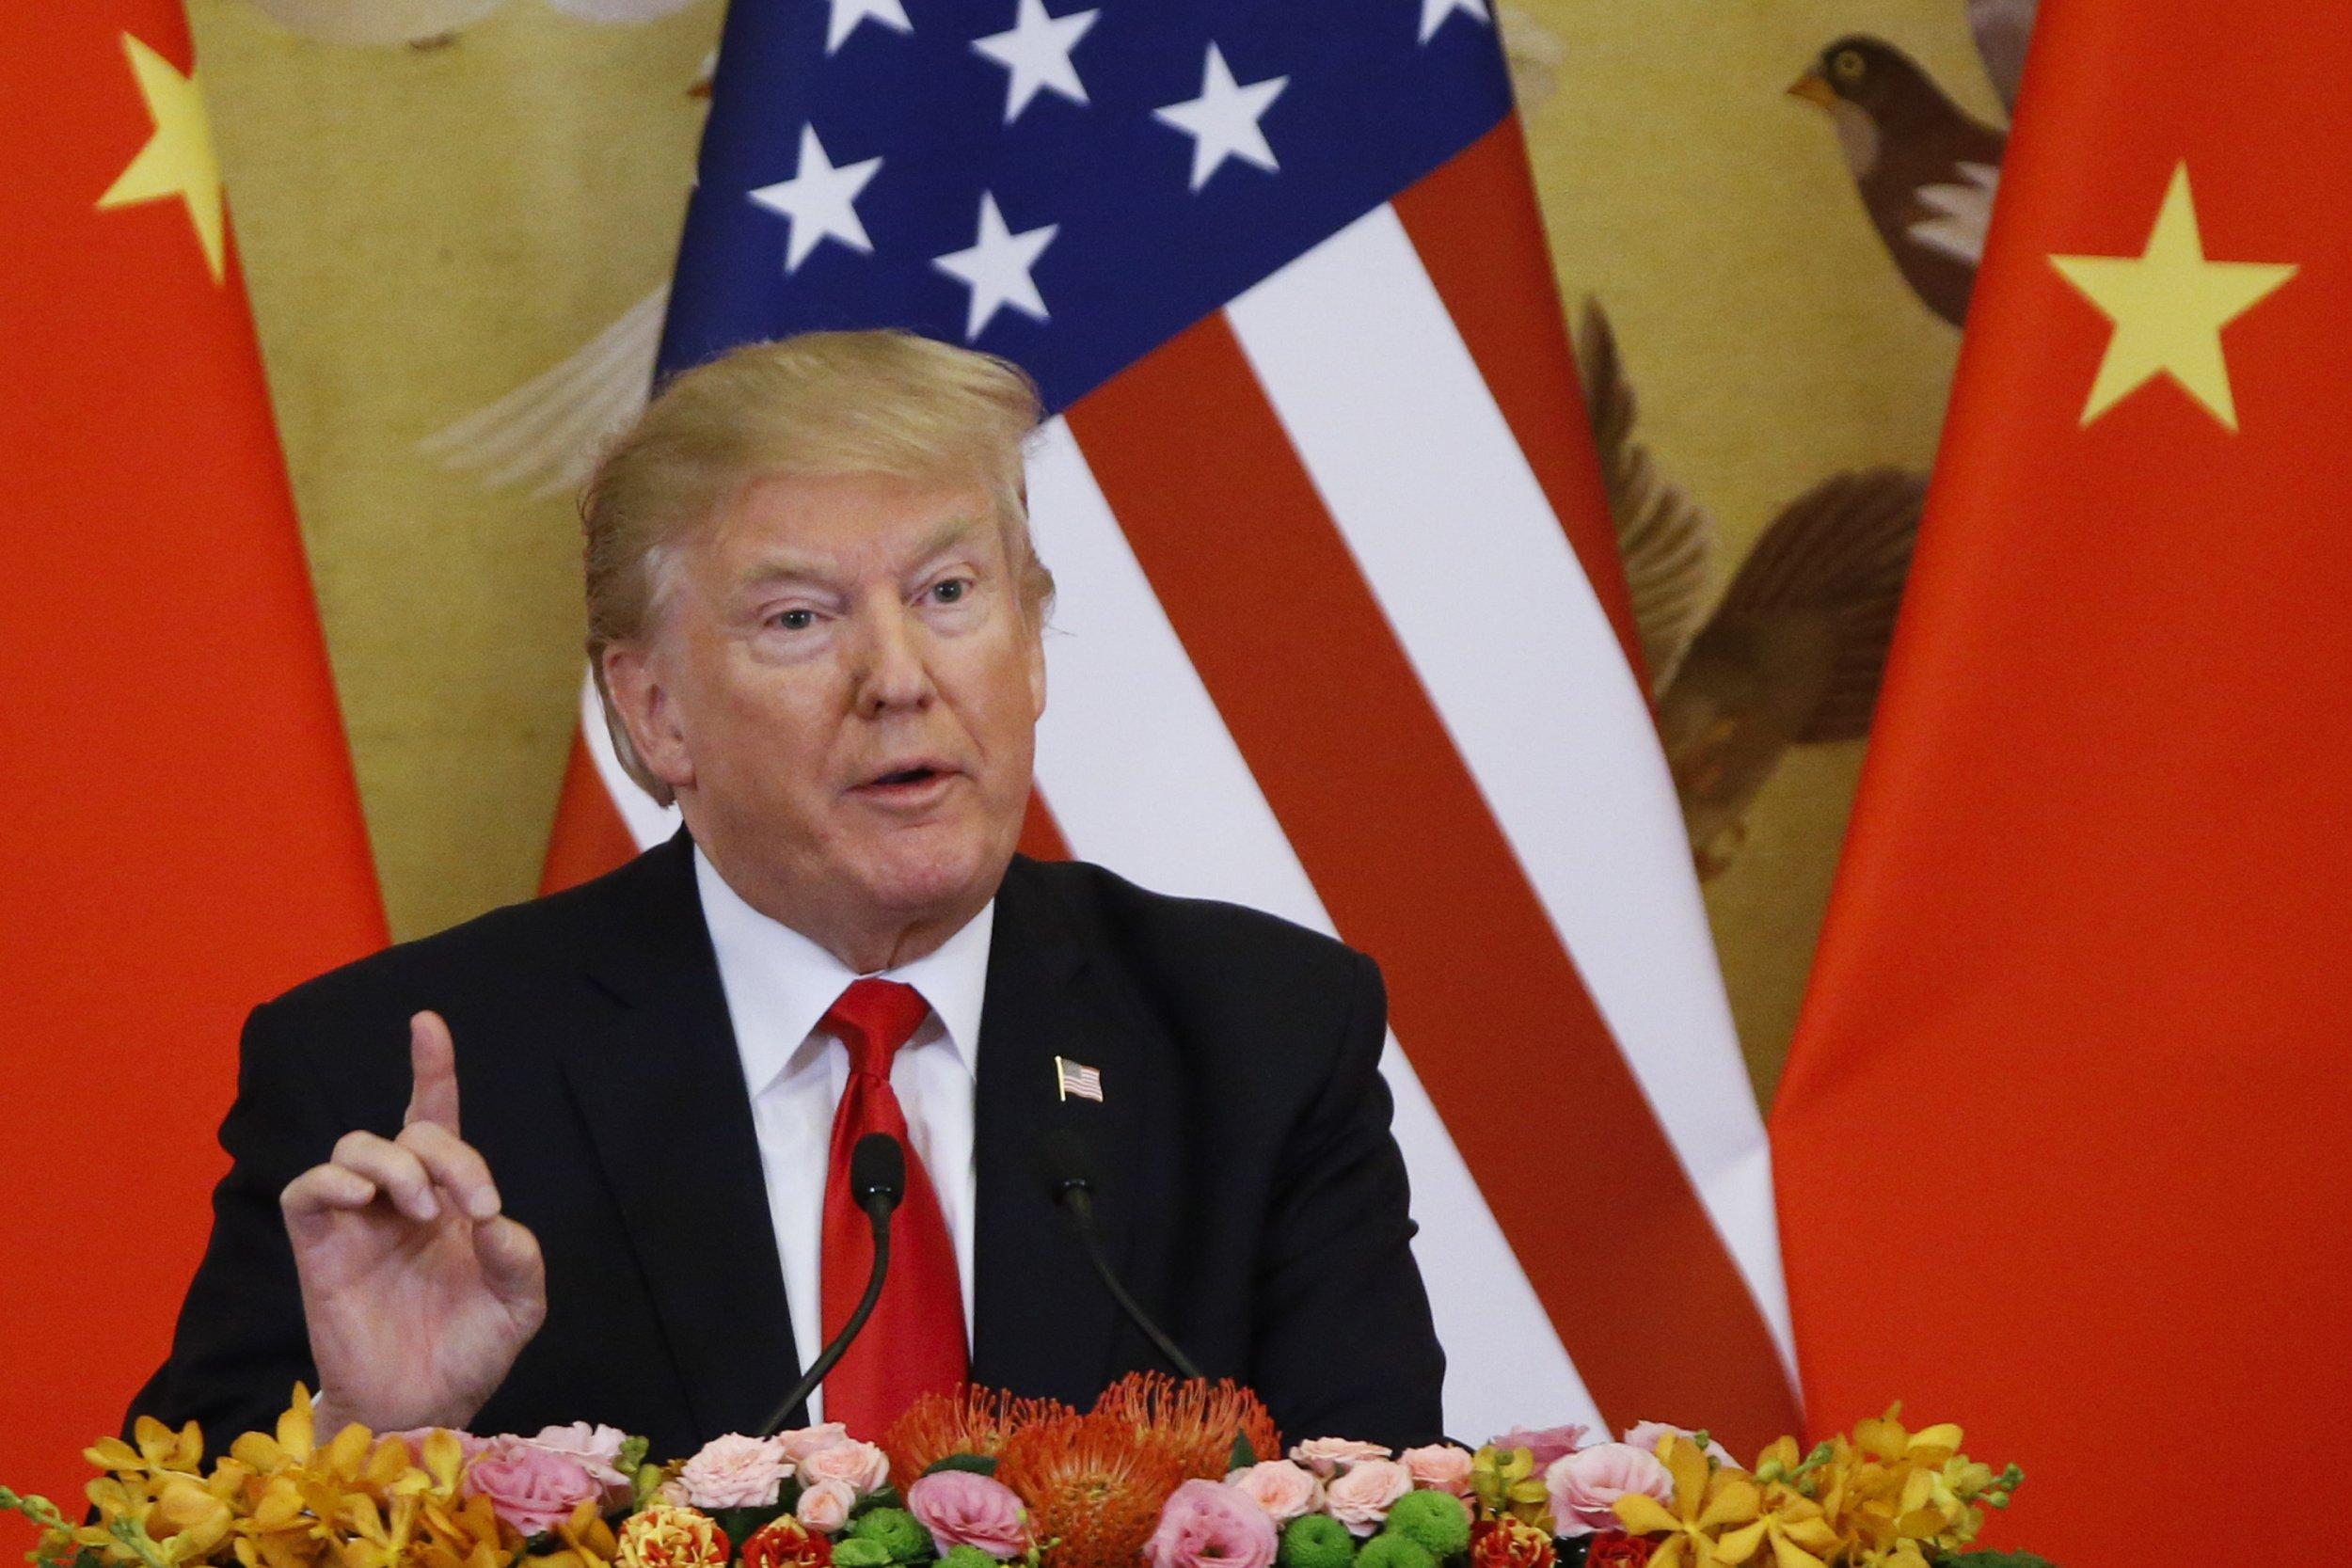 Donald Trump China monster Obama Bush Clinton trade war